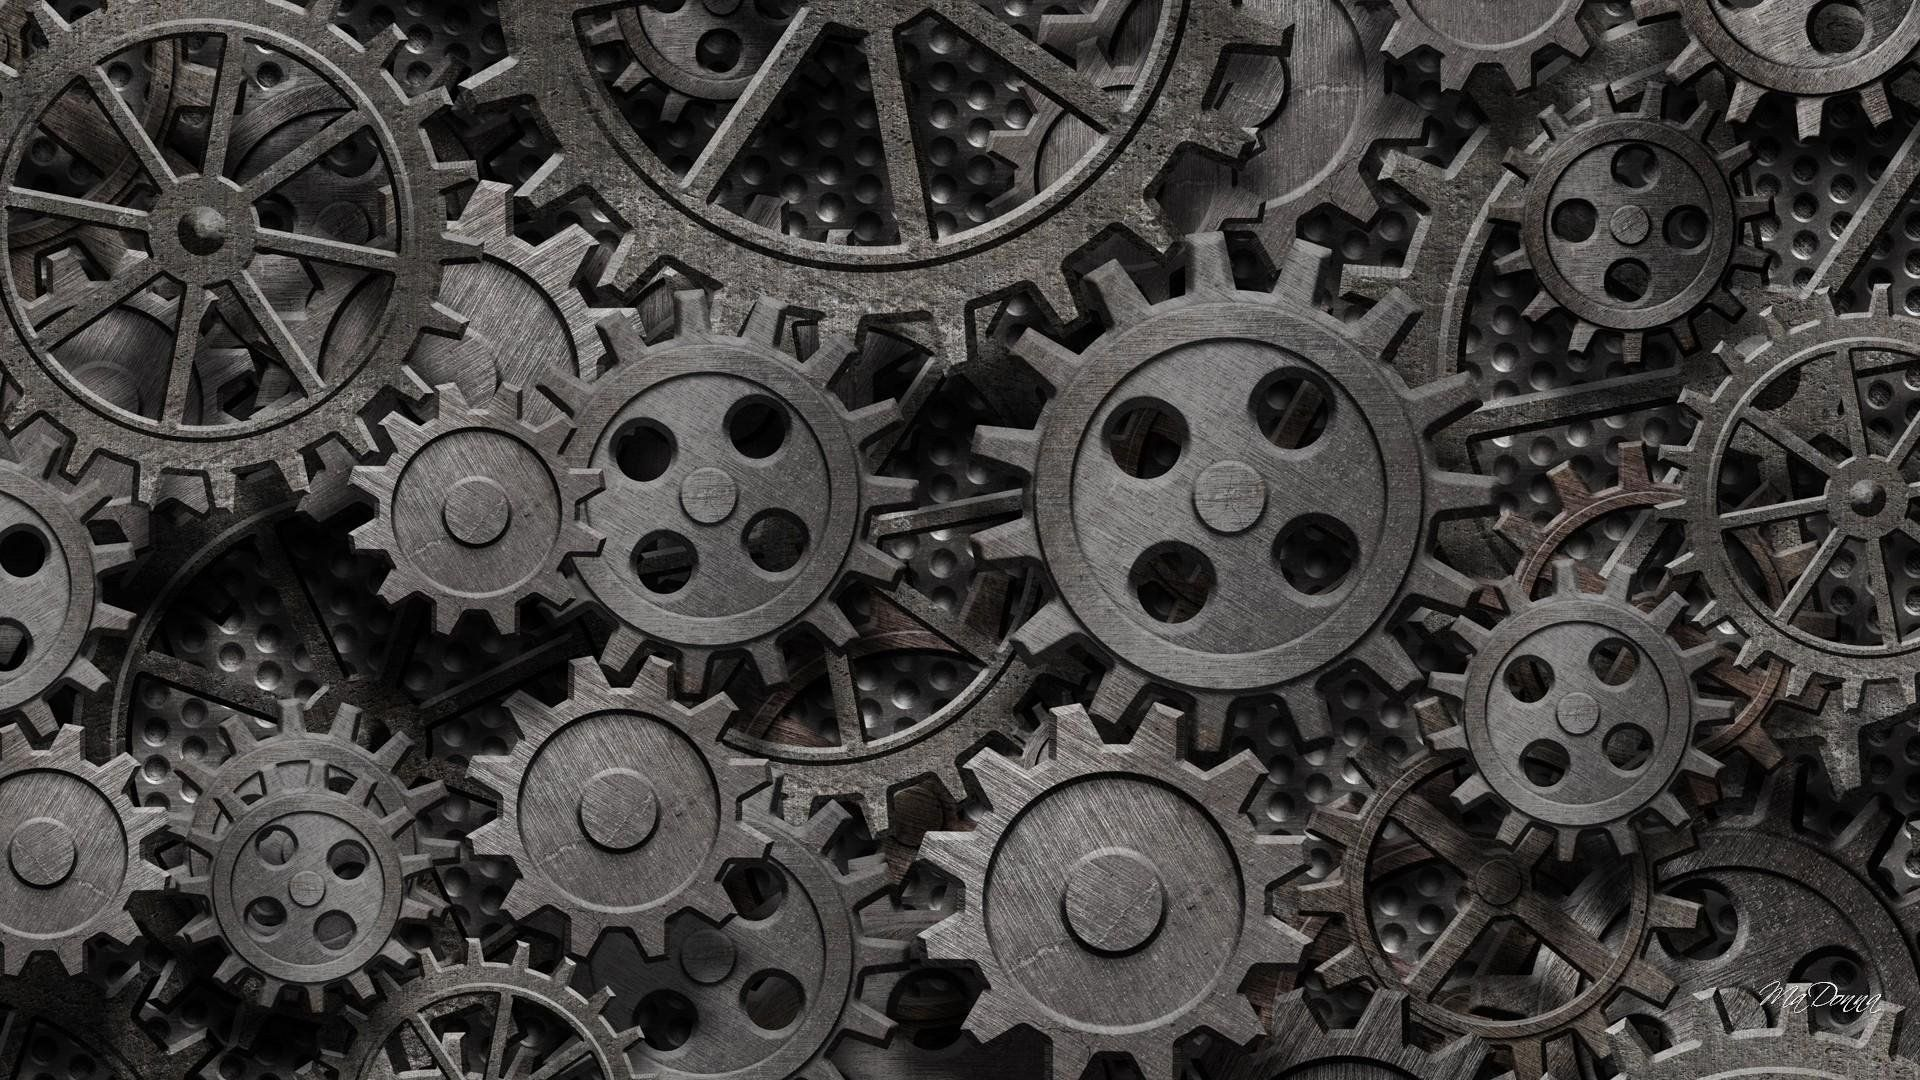 Mechanical Engineering Wallpapers Hd Engranajes